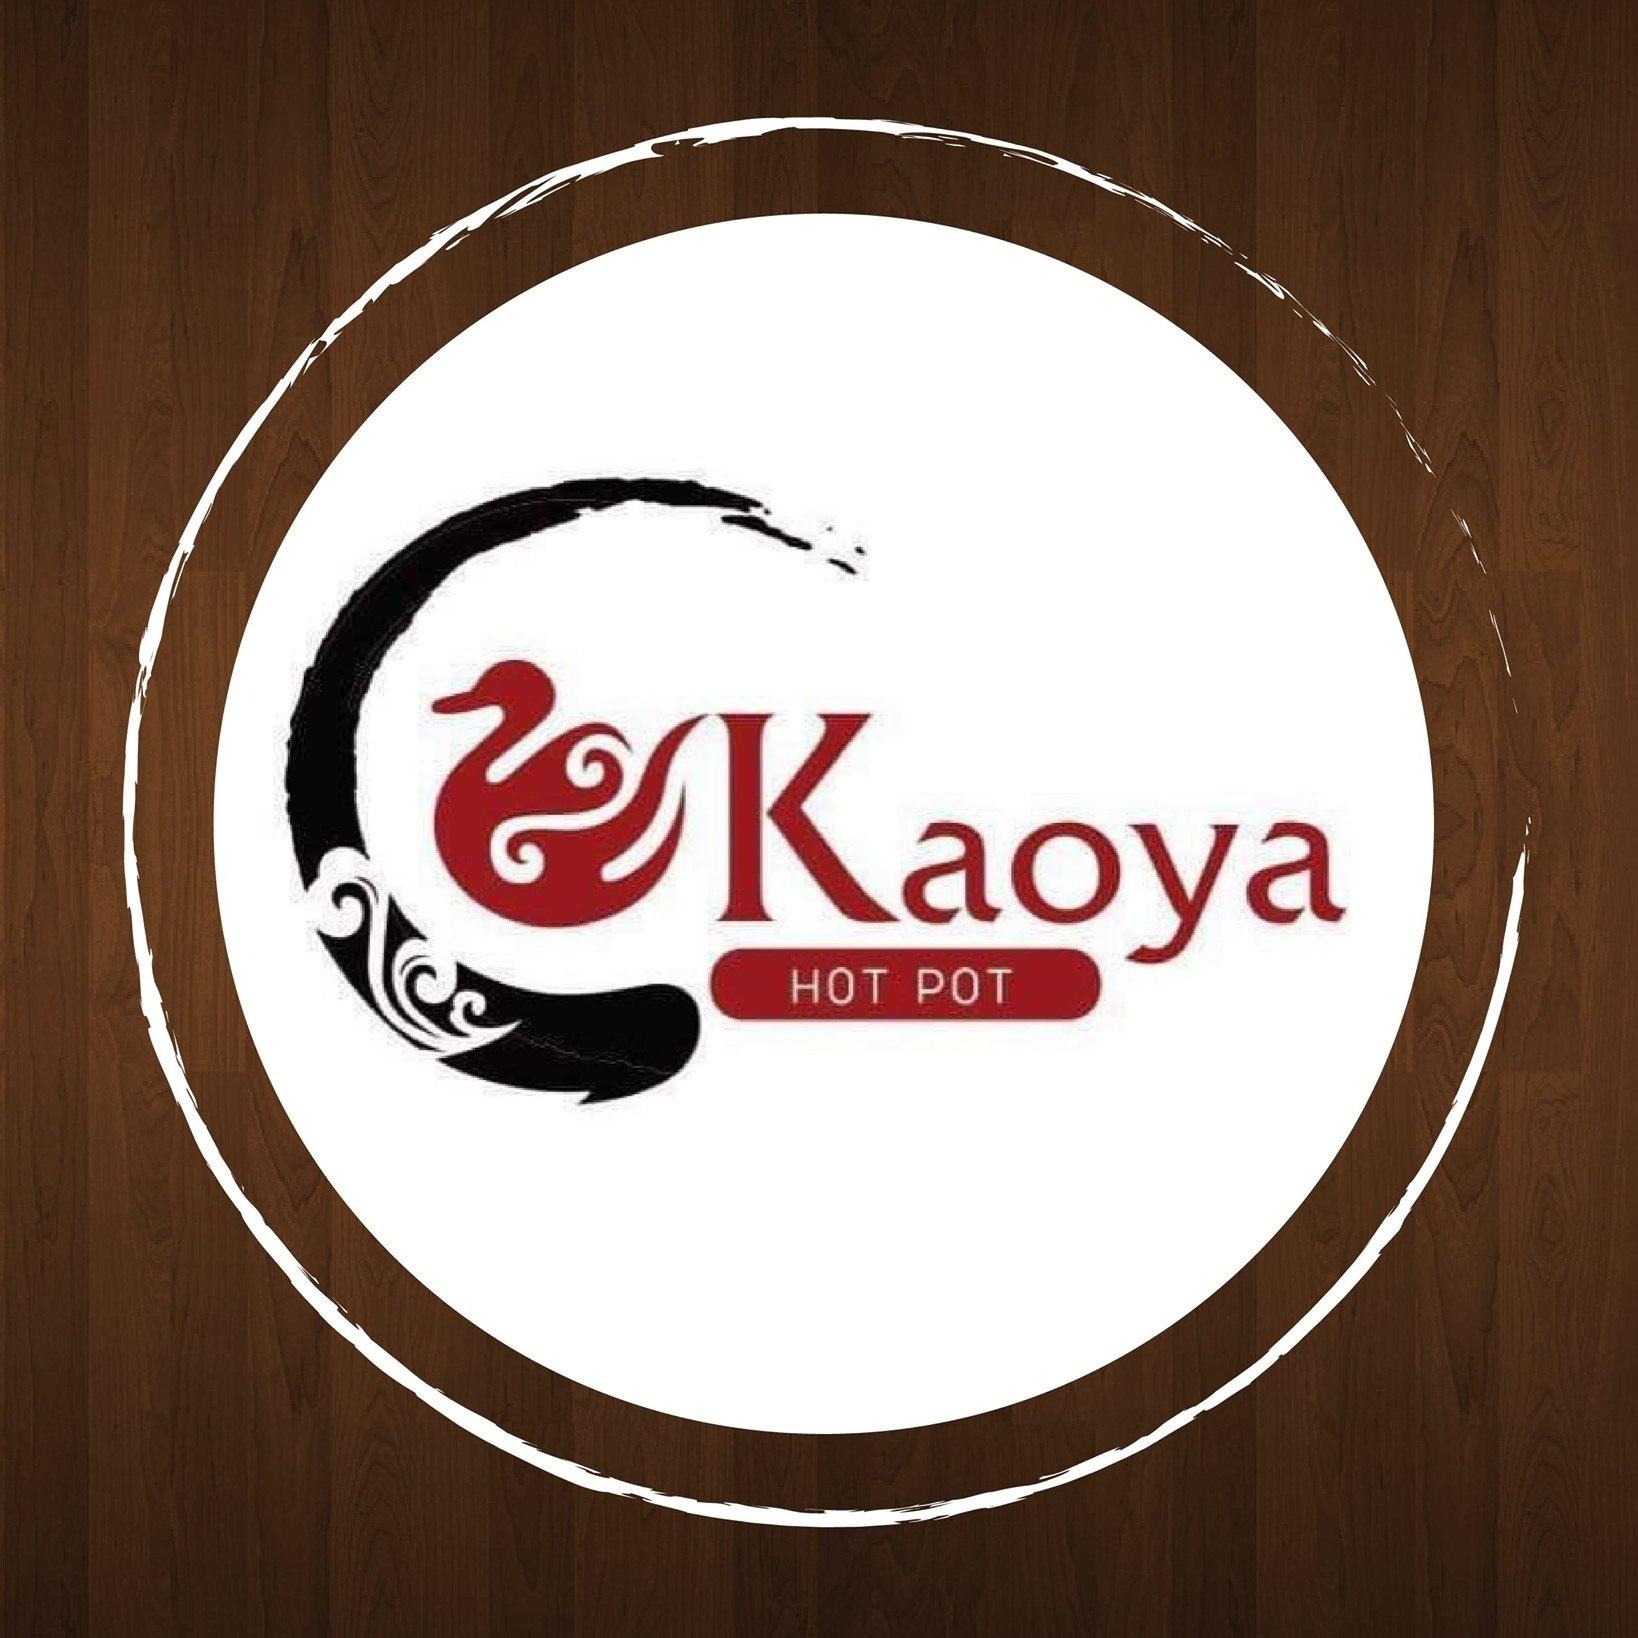 Đồ ăn nhanh KAOYA HOTPOT